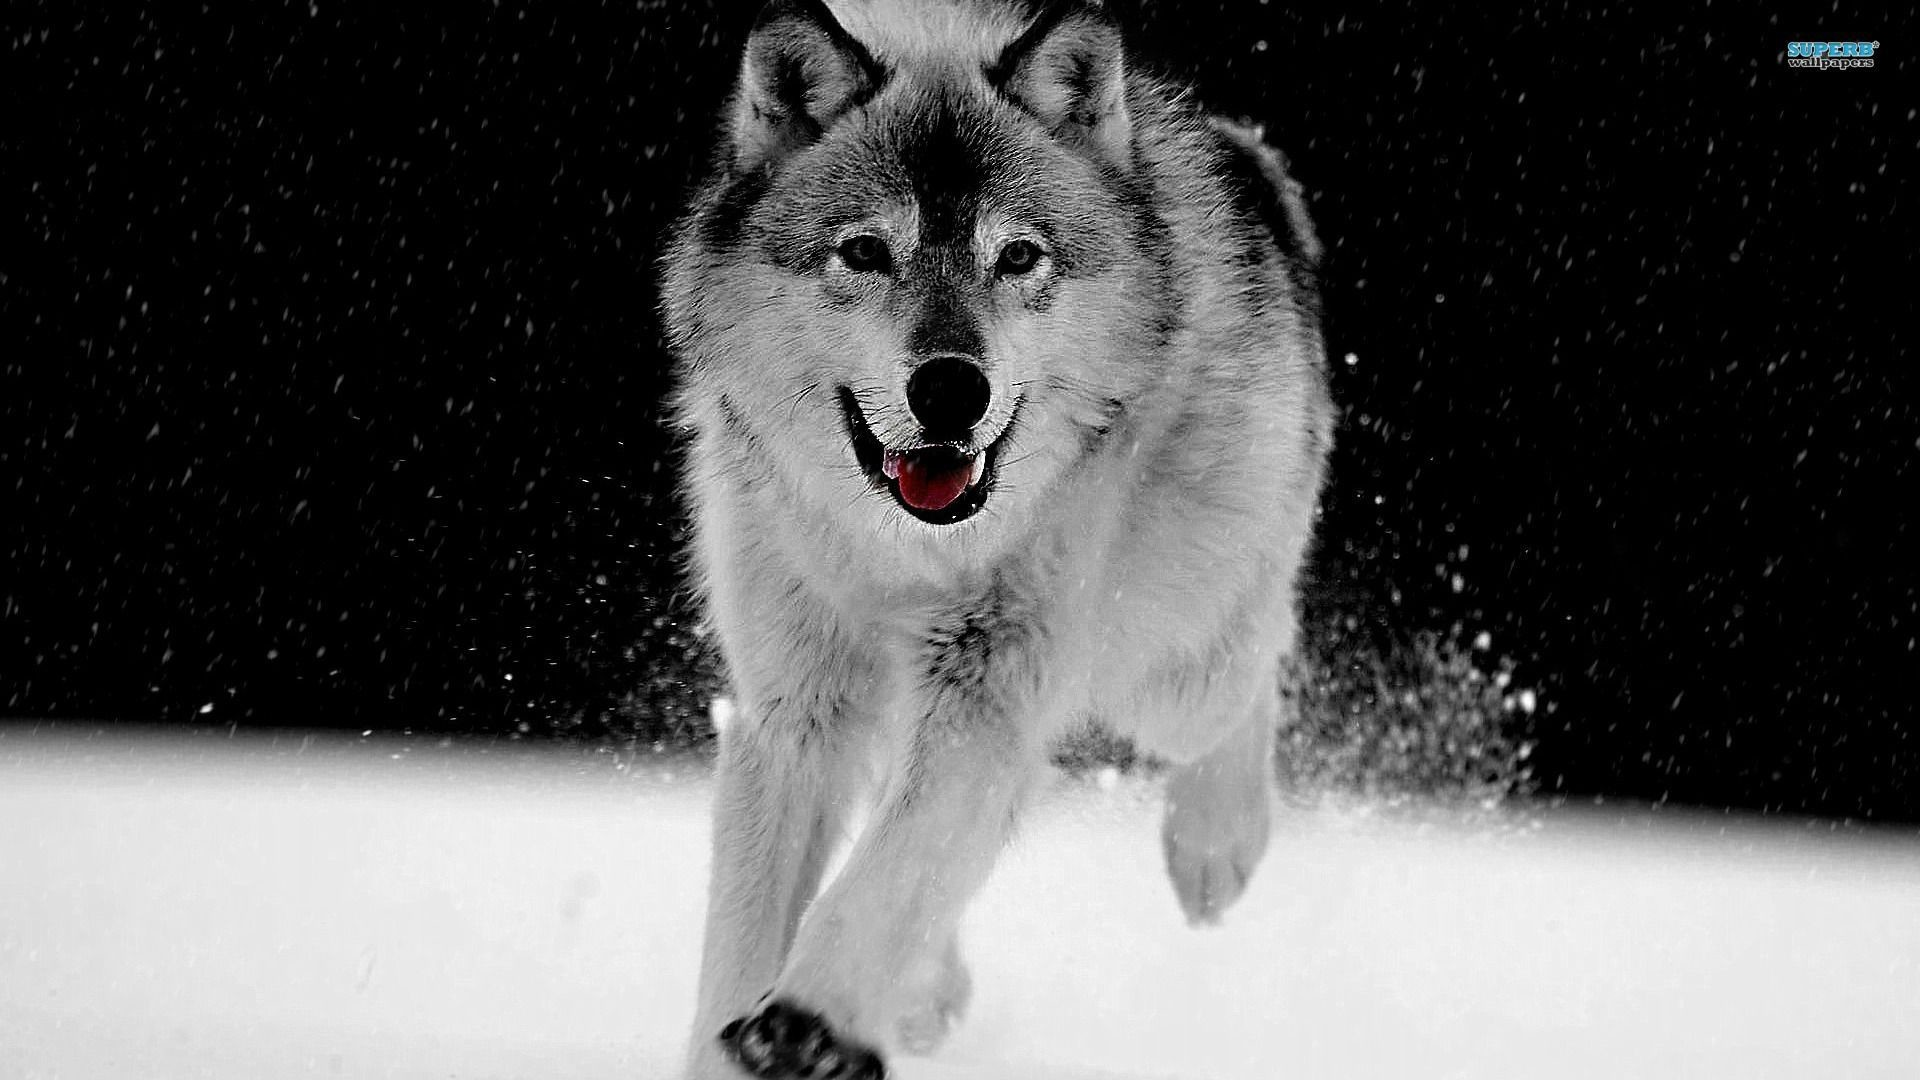 Res: 1920x1080, Full HD p Wolf Wallpapers HD, Desktop Backgrounds 1920×1080 Wolf Wallpaper  (39